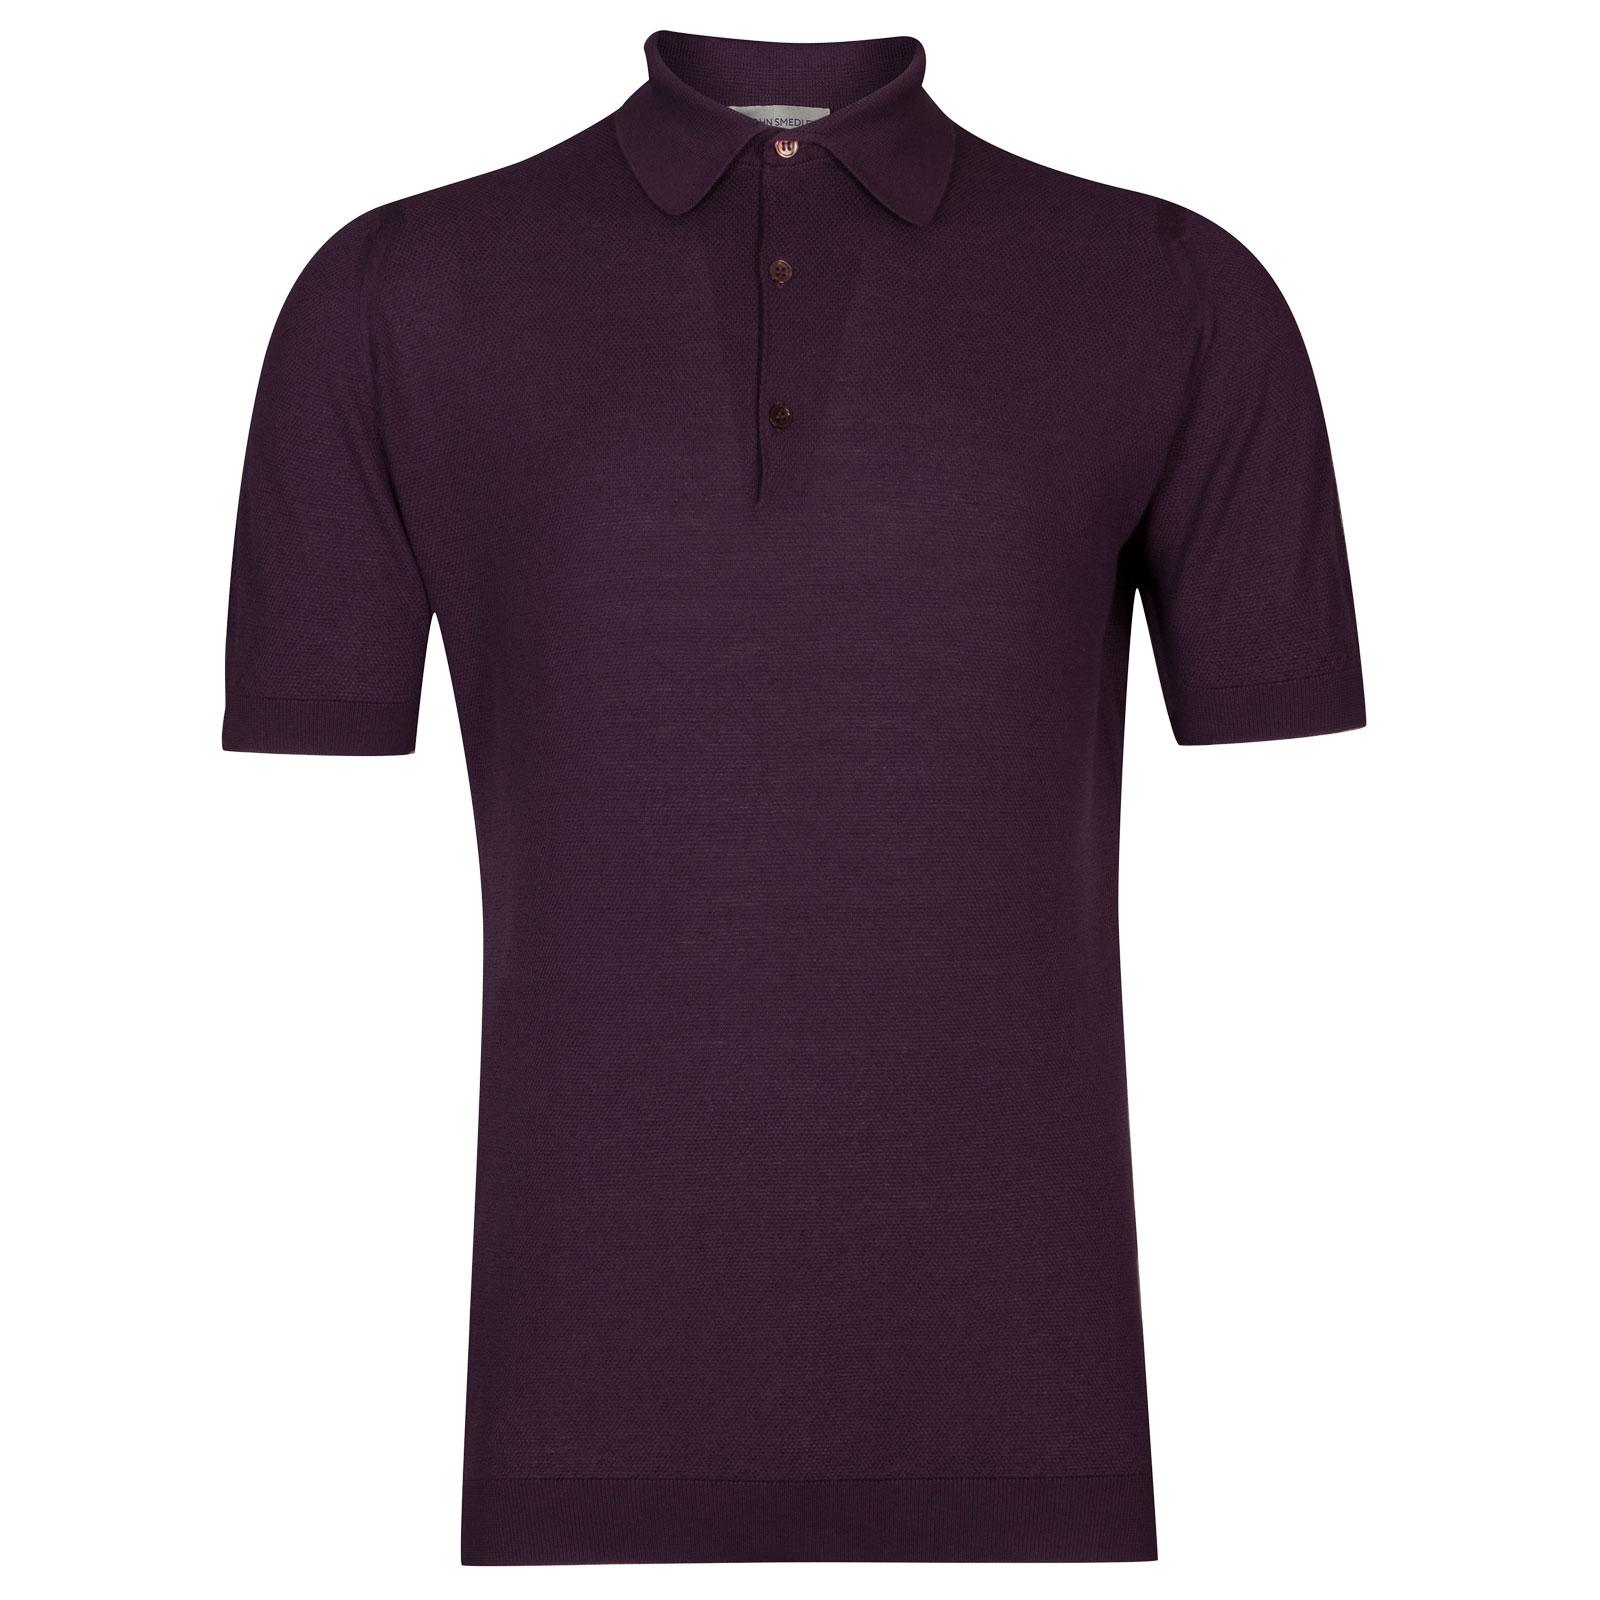 roth-bauhaus-purple-S